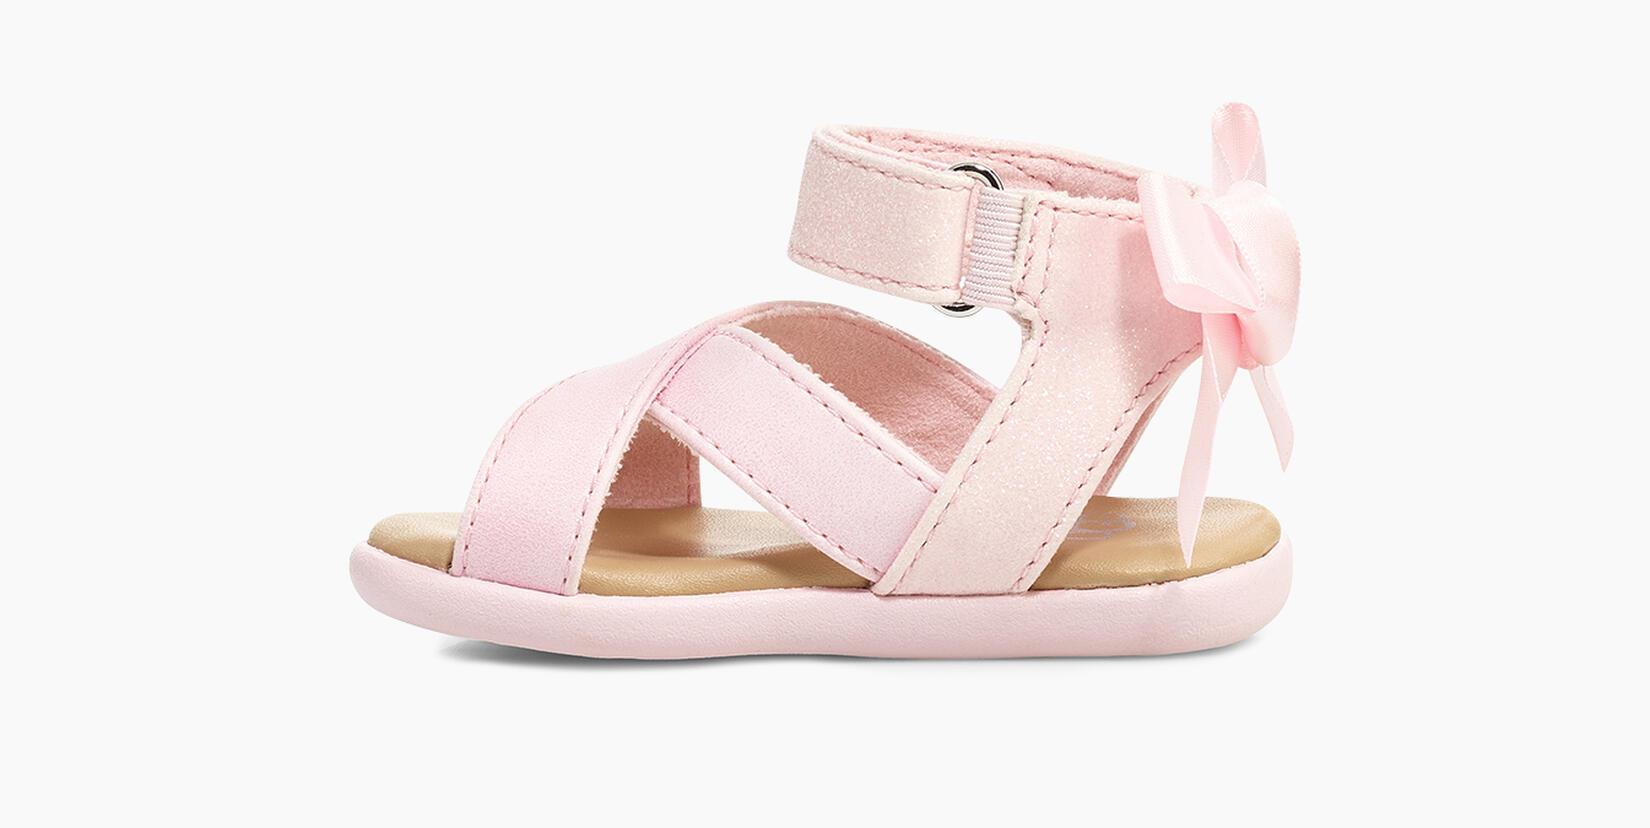 Maggiepie Sparkles Sandal